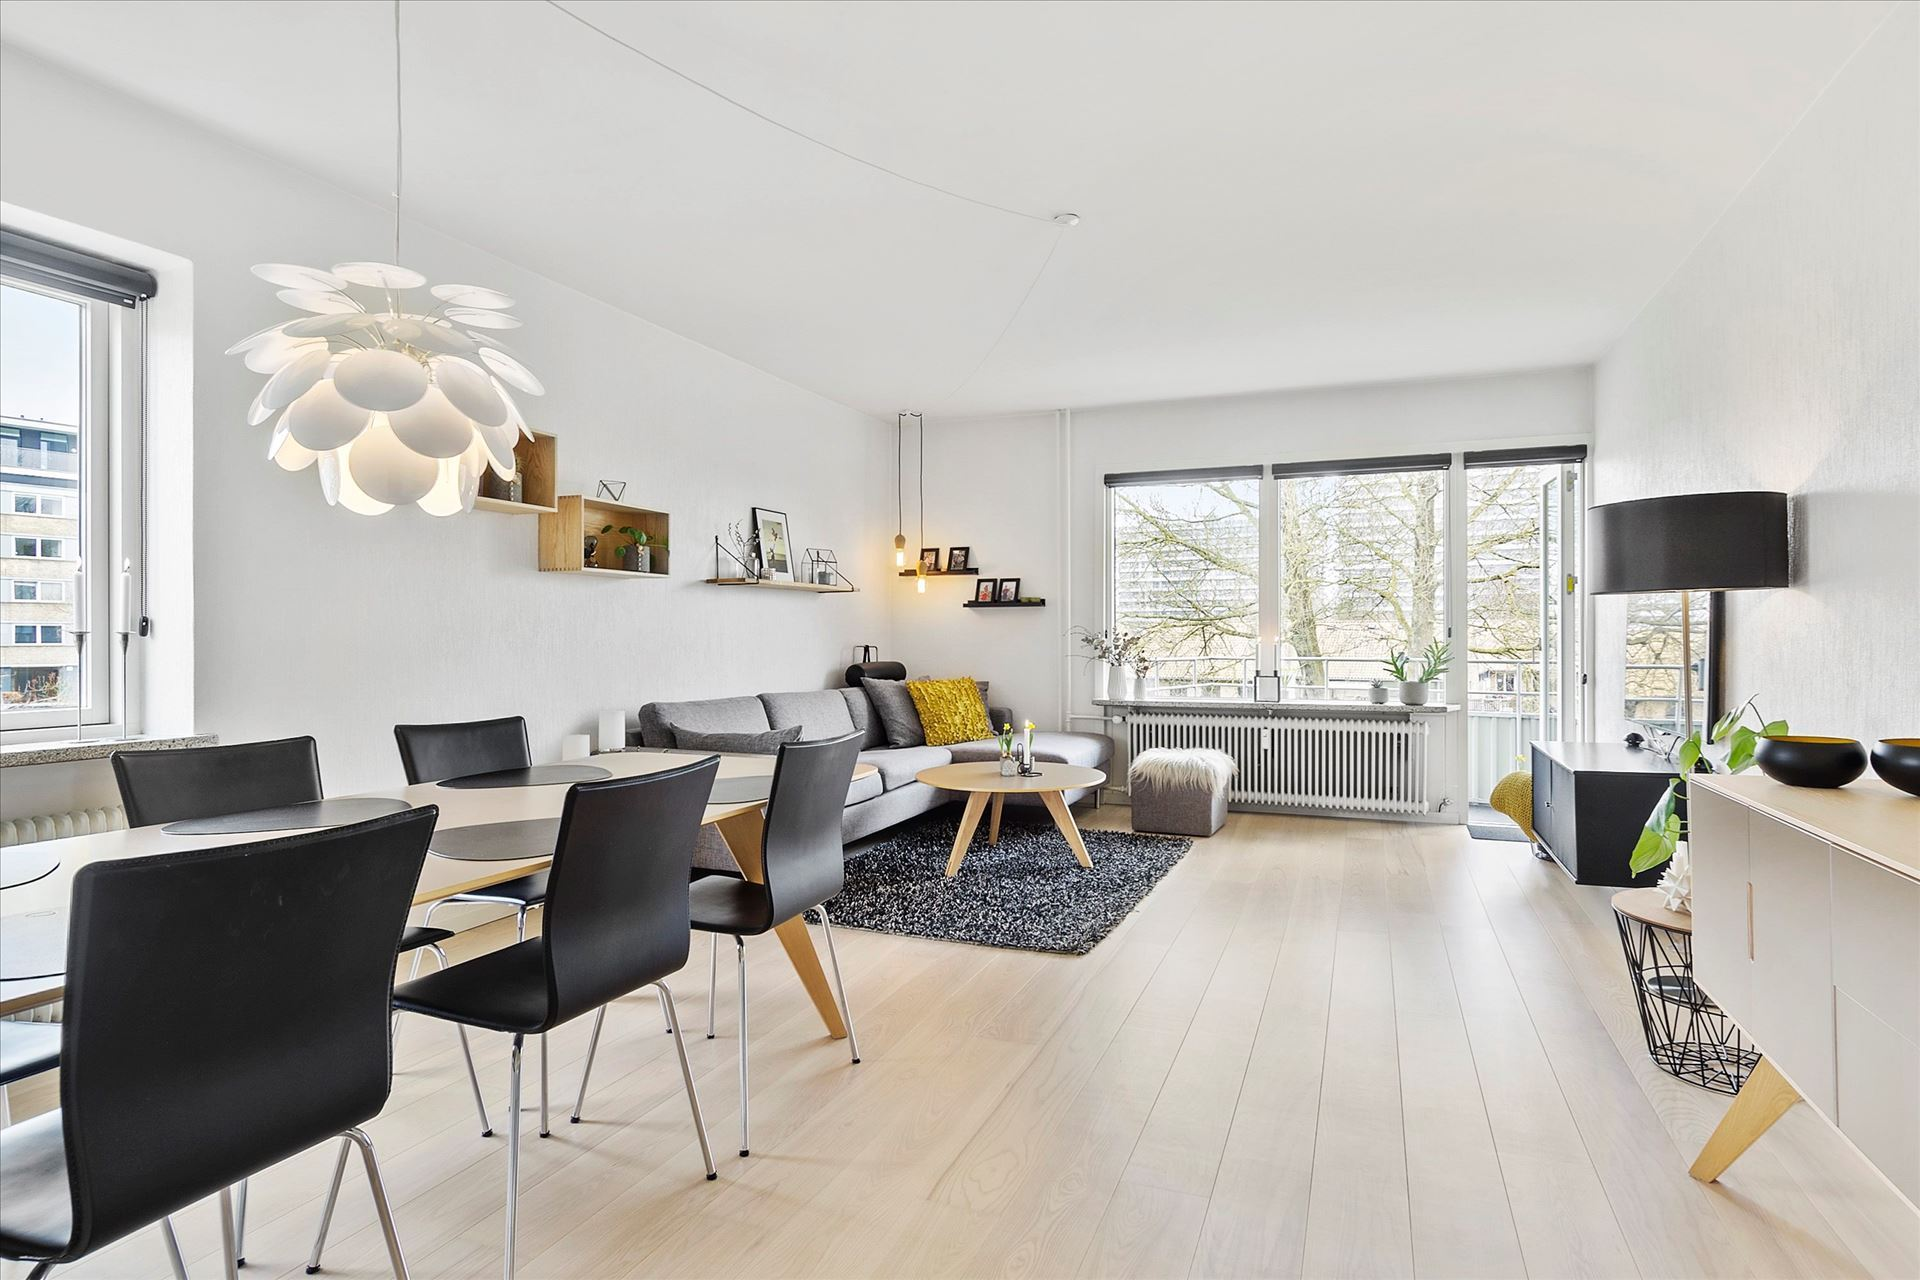 Nordborggade 27, 1. mf, 8000 Aarhus C